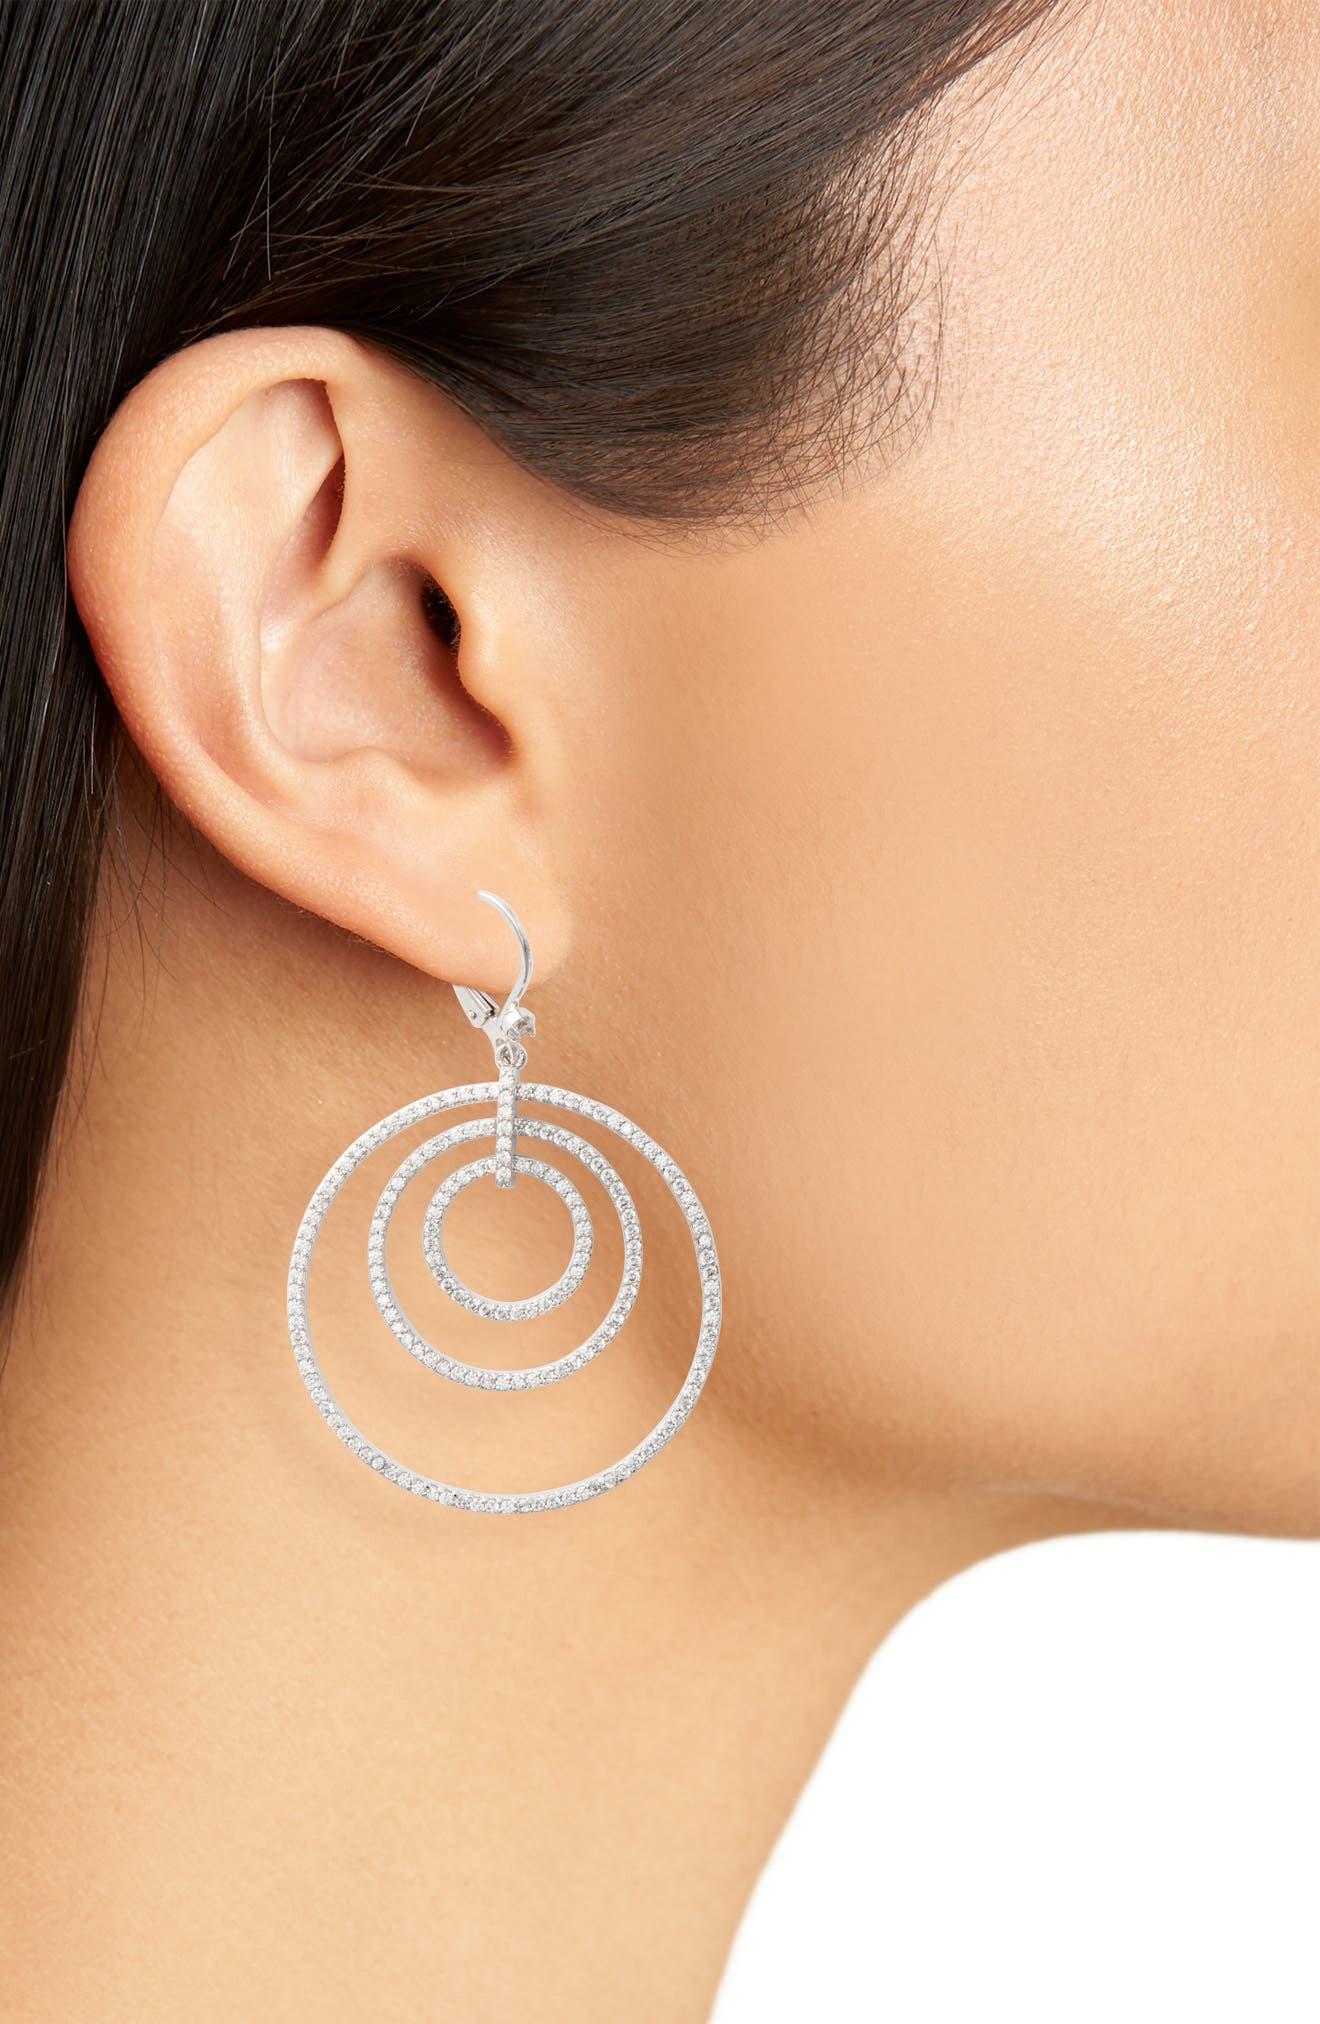 Orbital Drop Earrings,                             Alternate thumbnail 2, color,                             WHITE/ SILVER